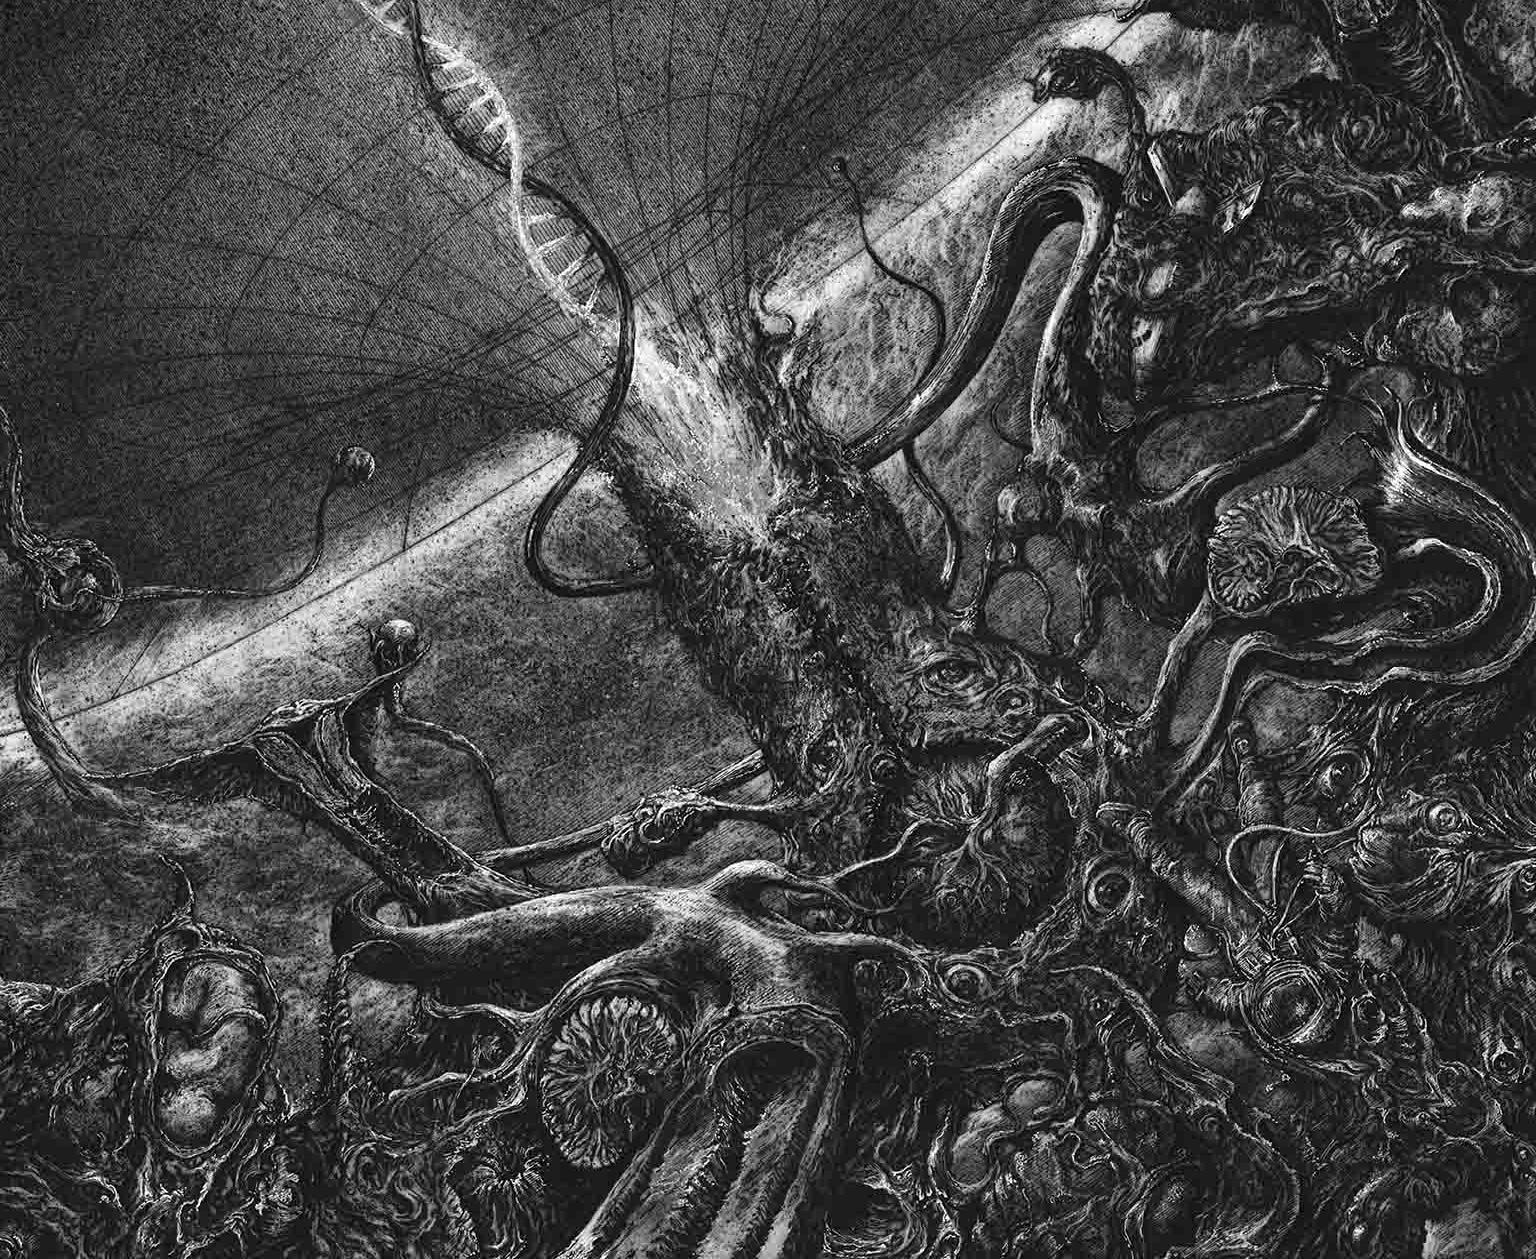 foto: Zbigniew M. Bielak; EXECRATION Return To The Void